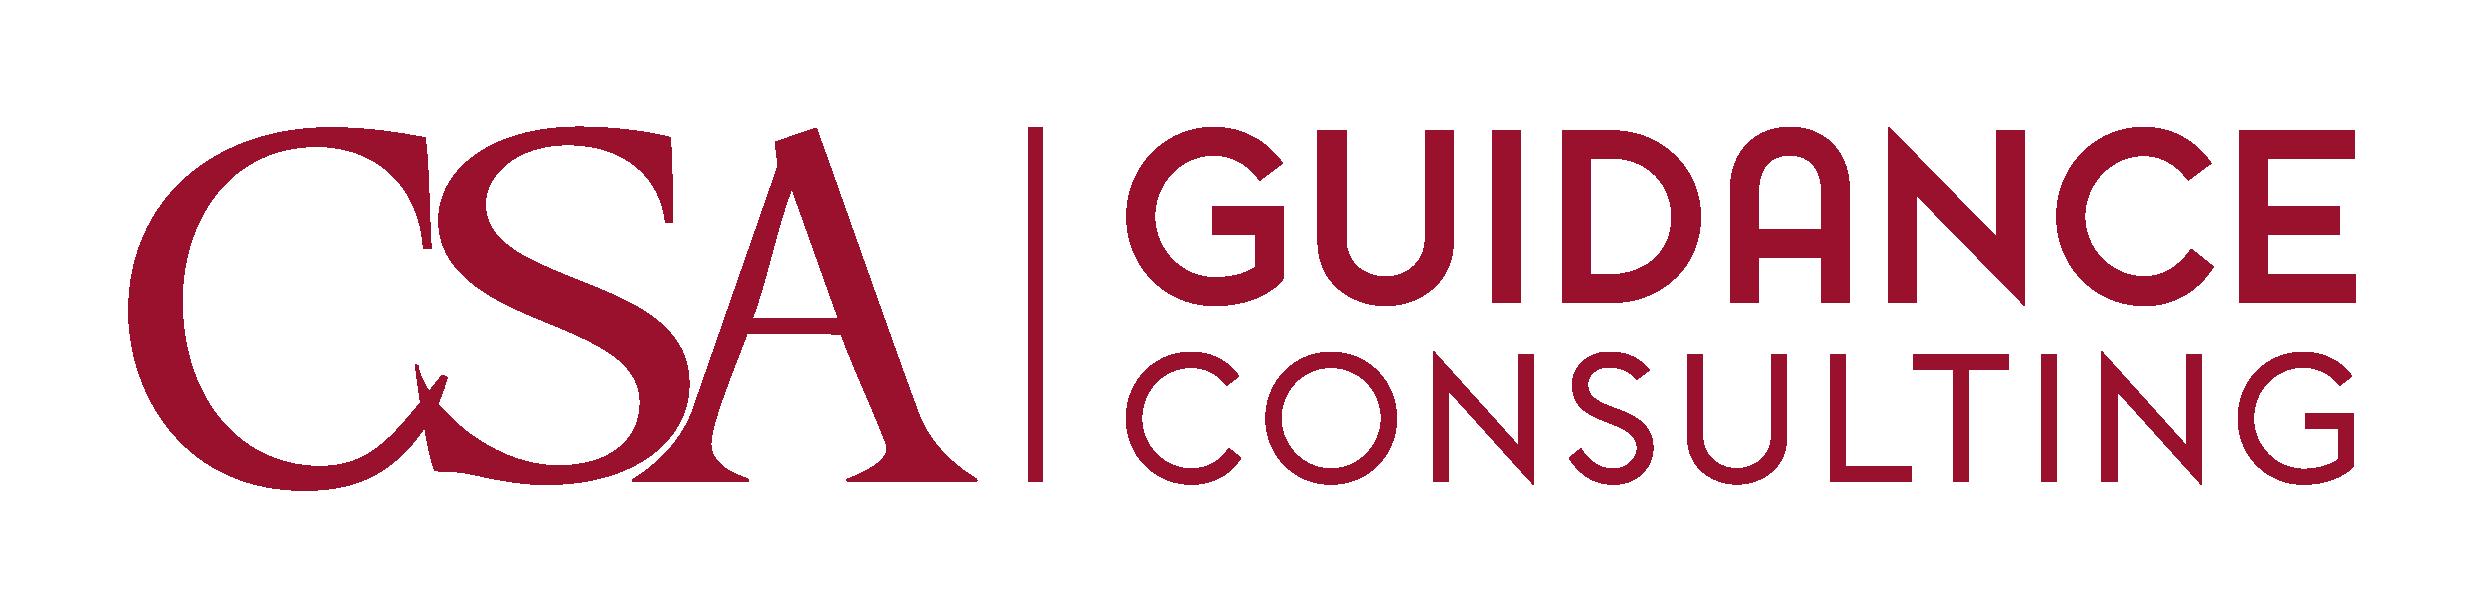 CSA Guidance Consulting logo